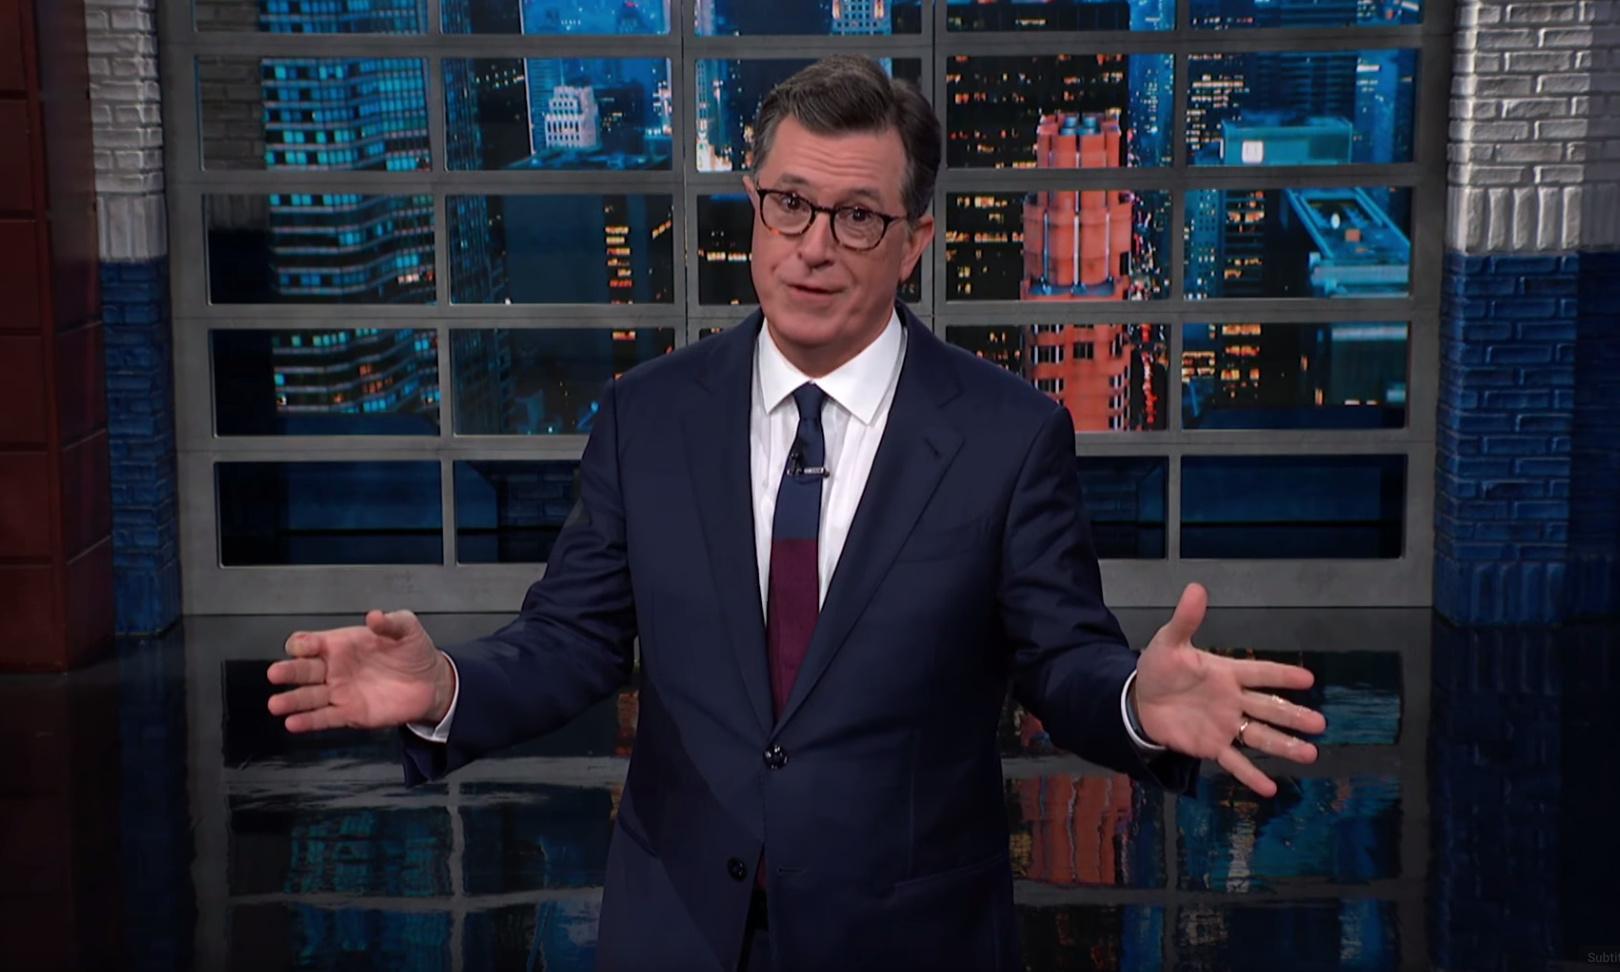 Stephen Colbert on Bolton: 'Another Trumpling bites the dumpling of dirt'